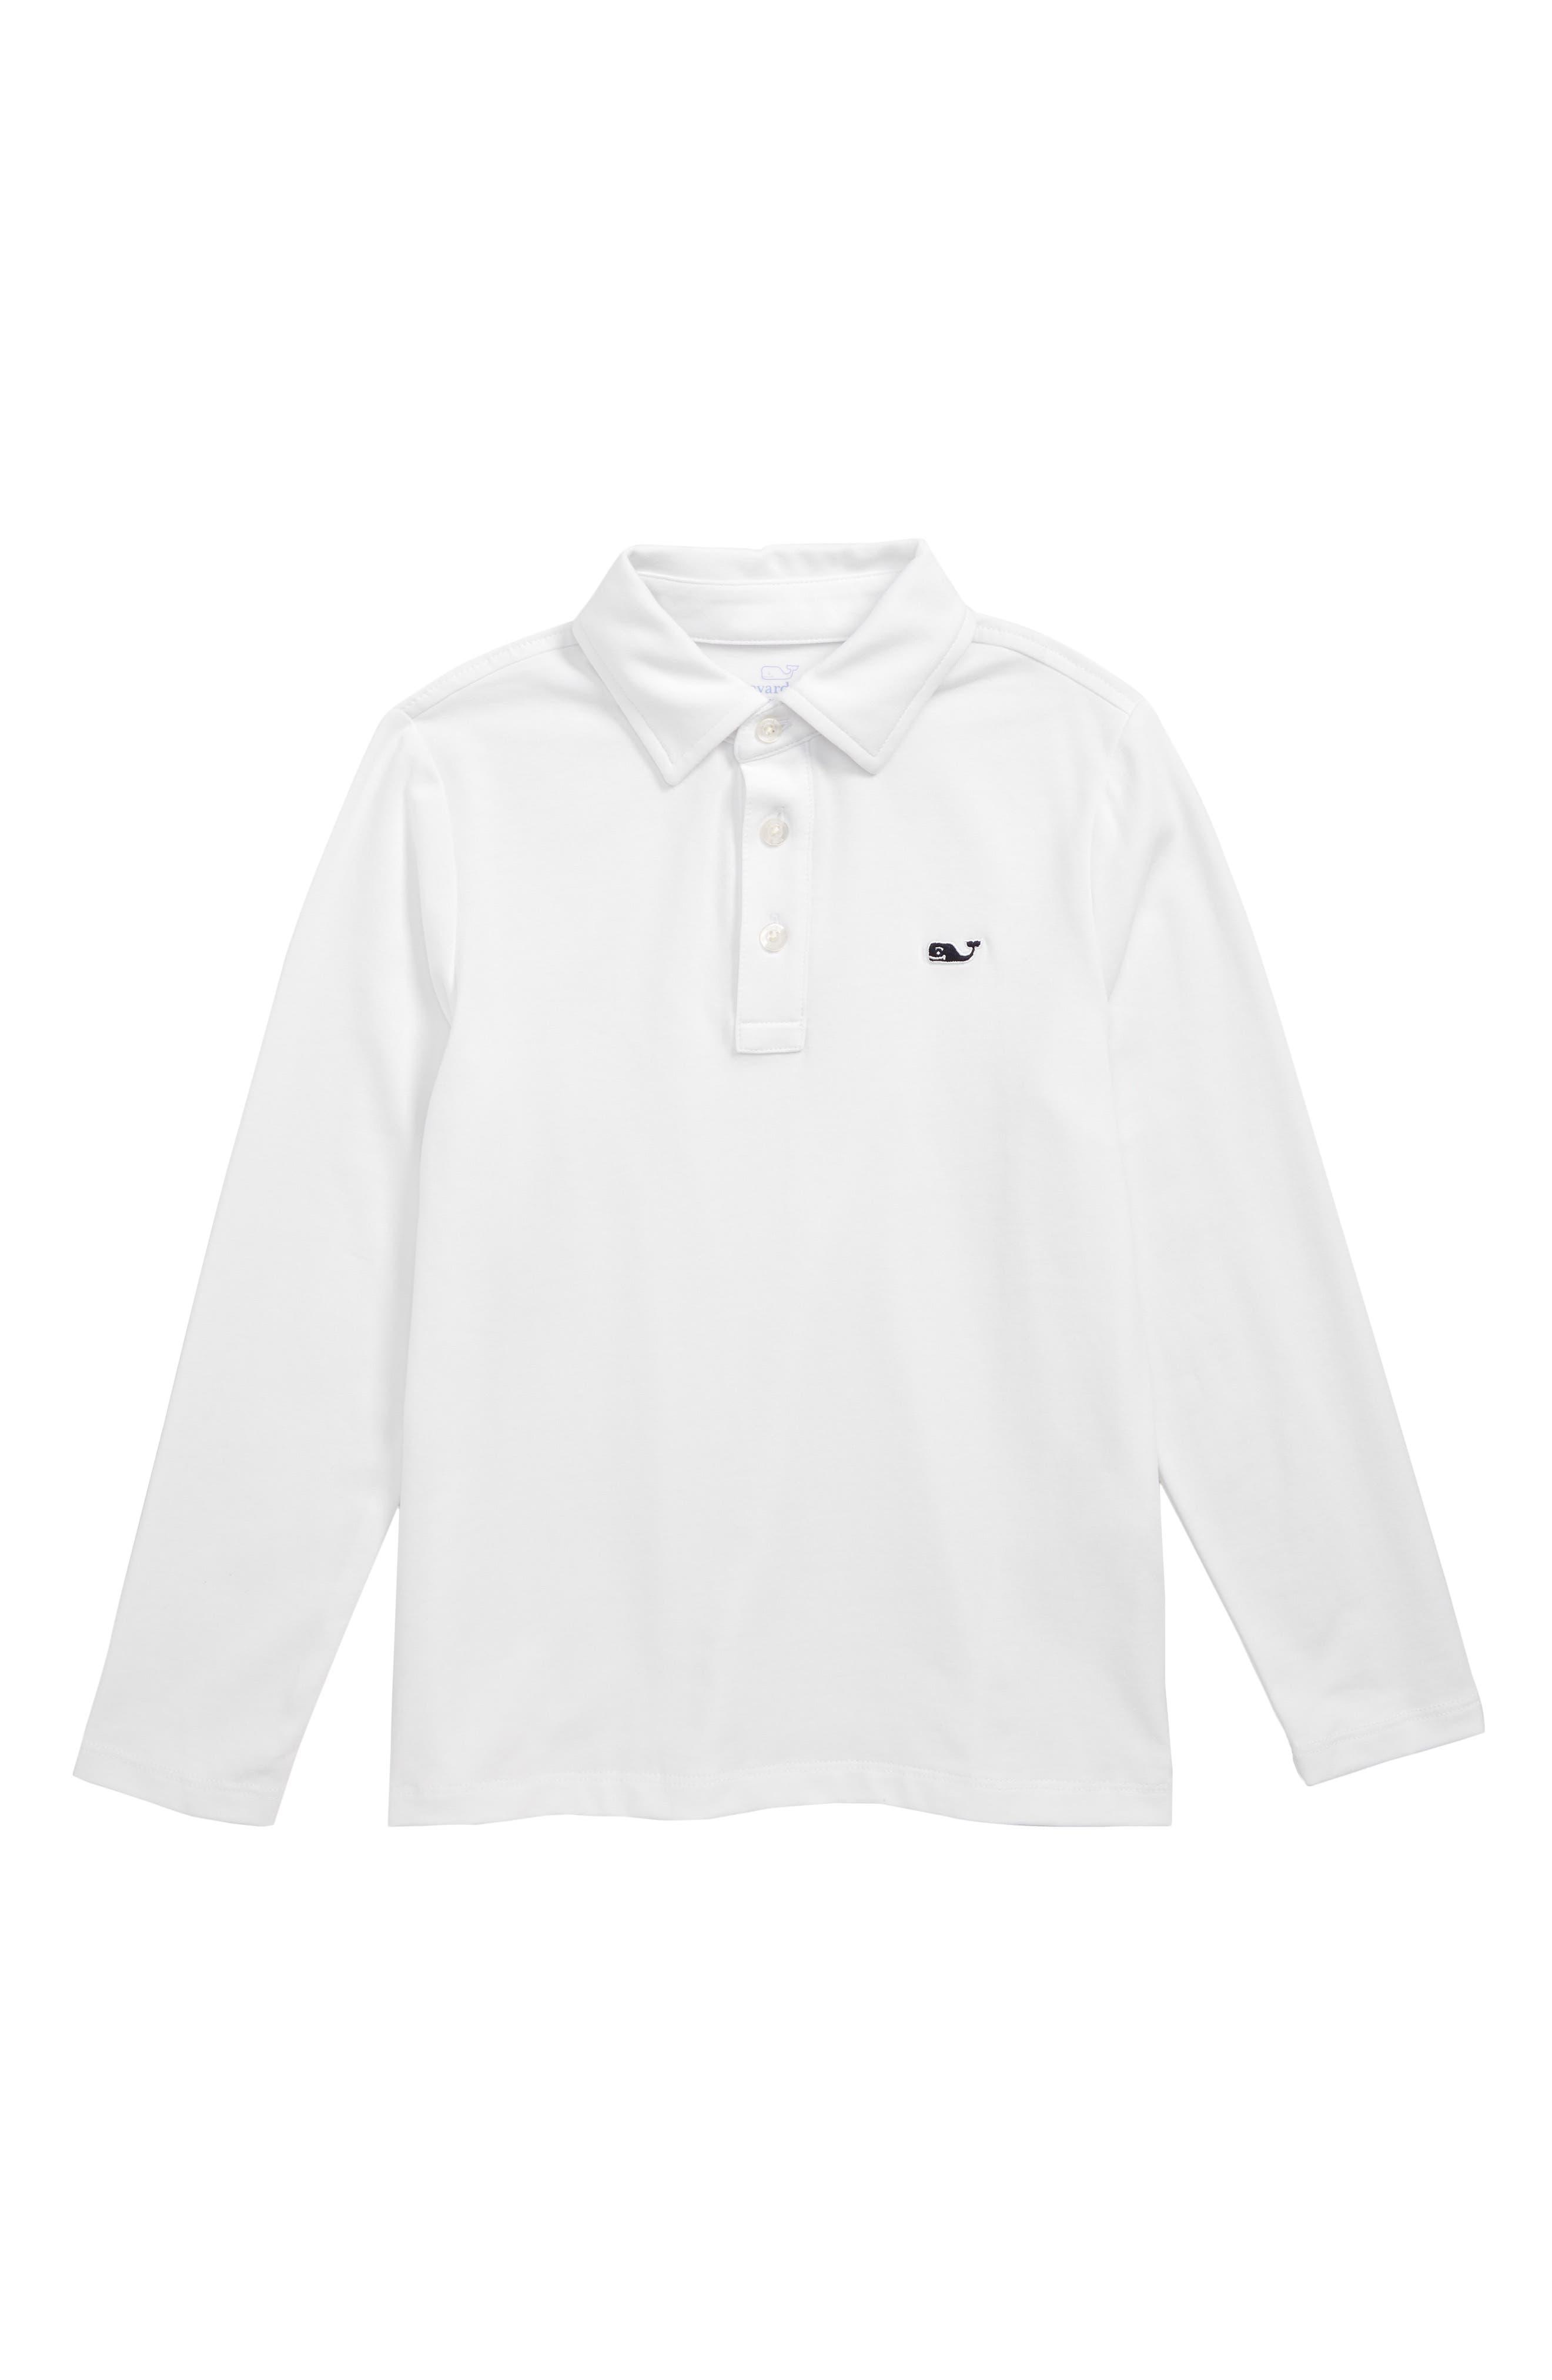 Edgartown Polo,                             Main thumbnail 1, color,                             WHITE CAP